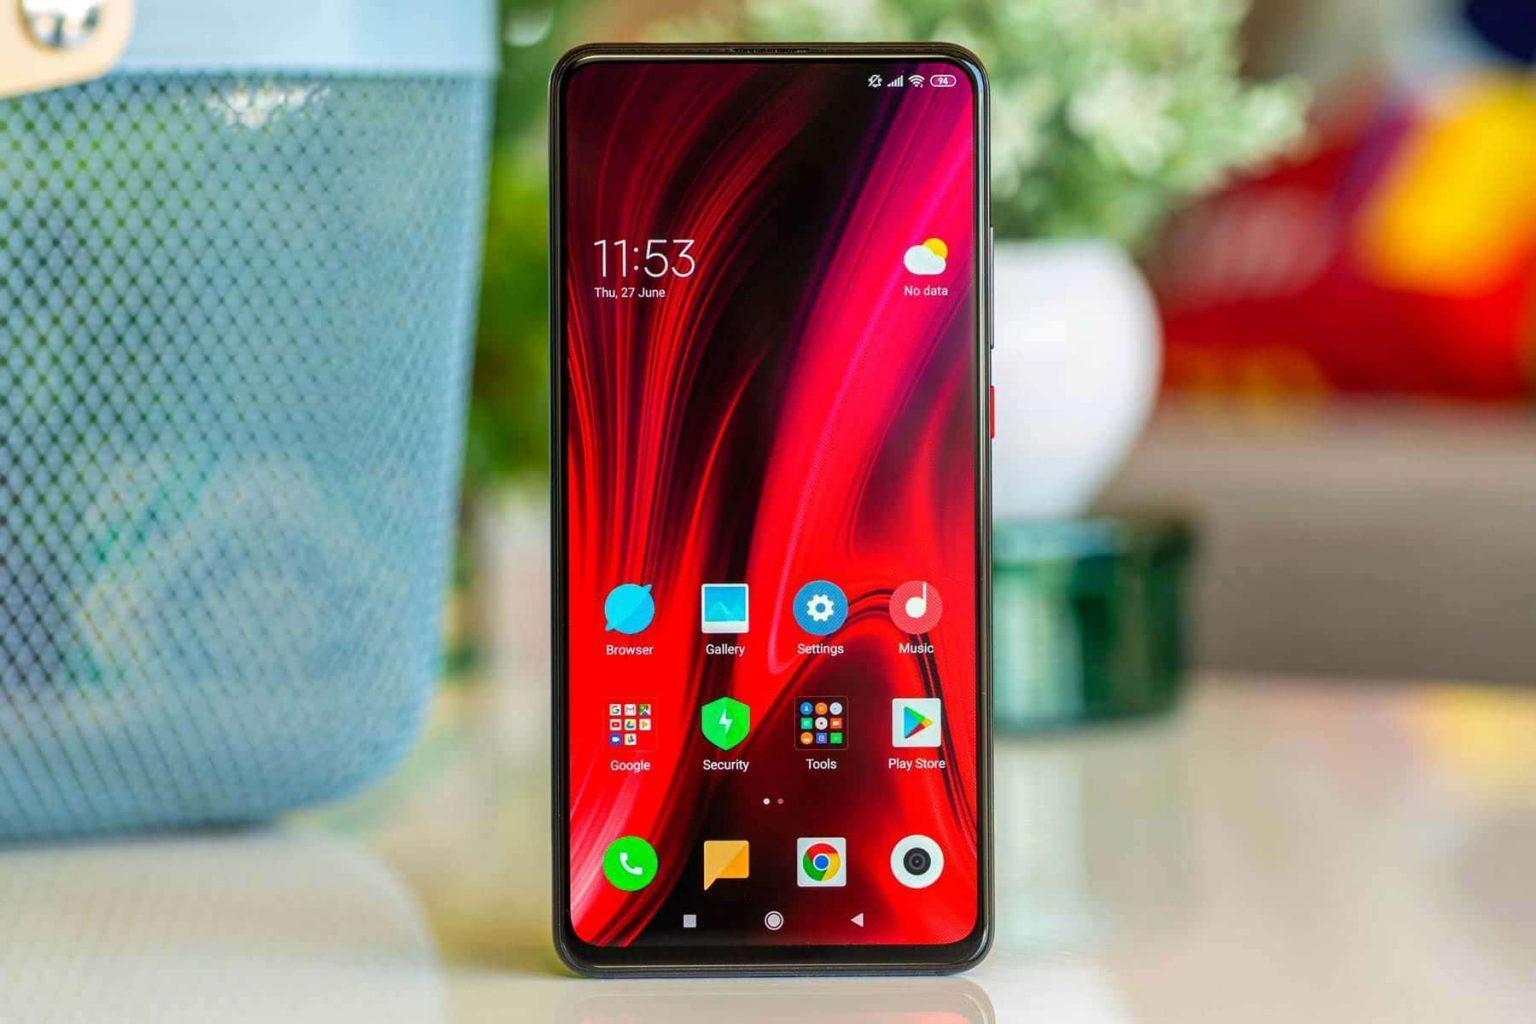 Xiaomi Mi 11 станет первым смартфоном на базе Snapdragon 875 (xiaomi mi 11 flagman smartfon 9 1536x1024 1)